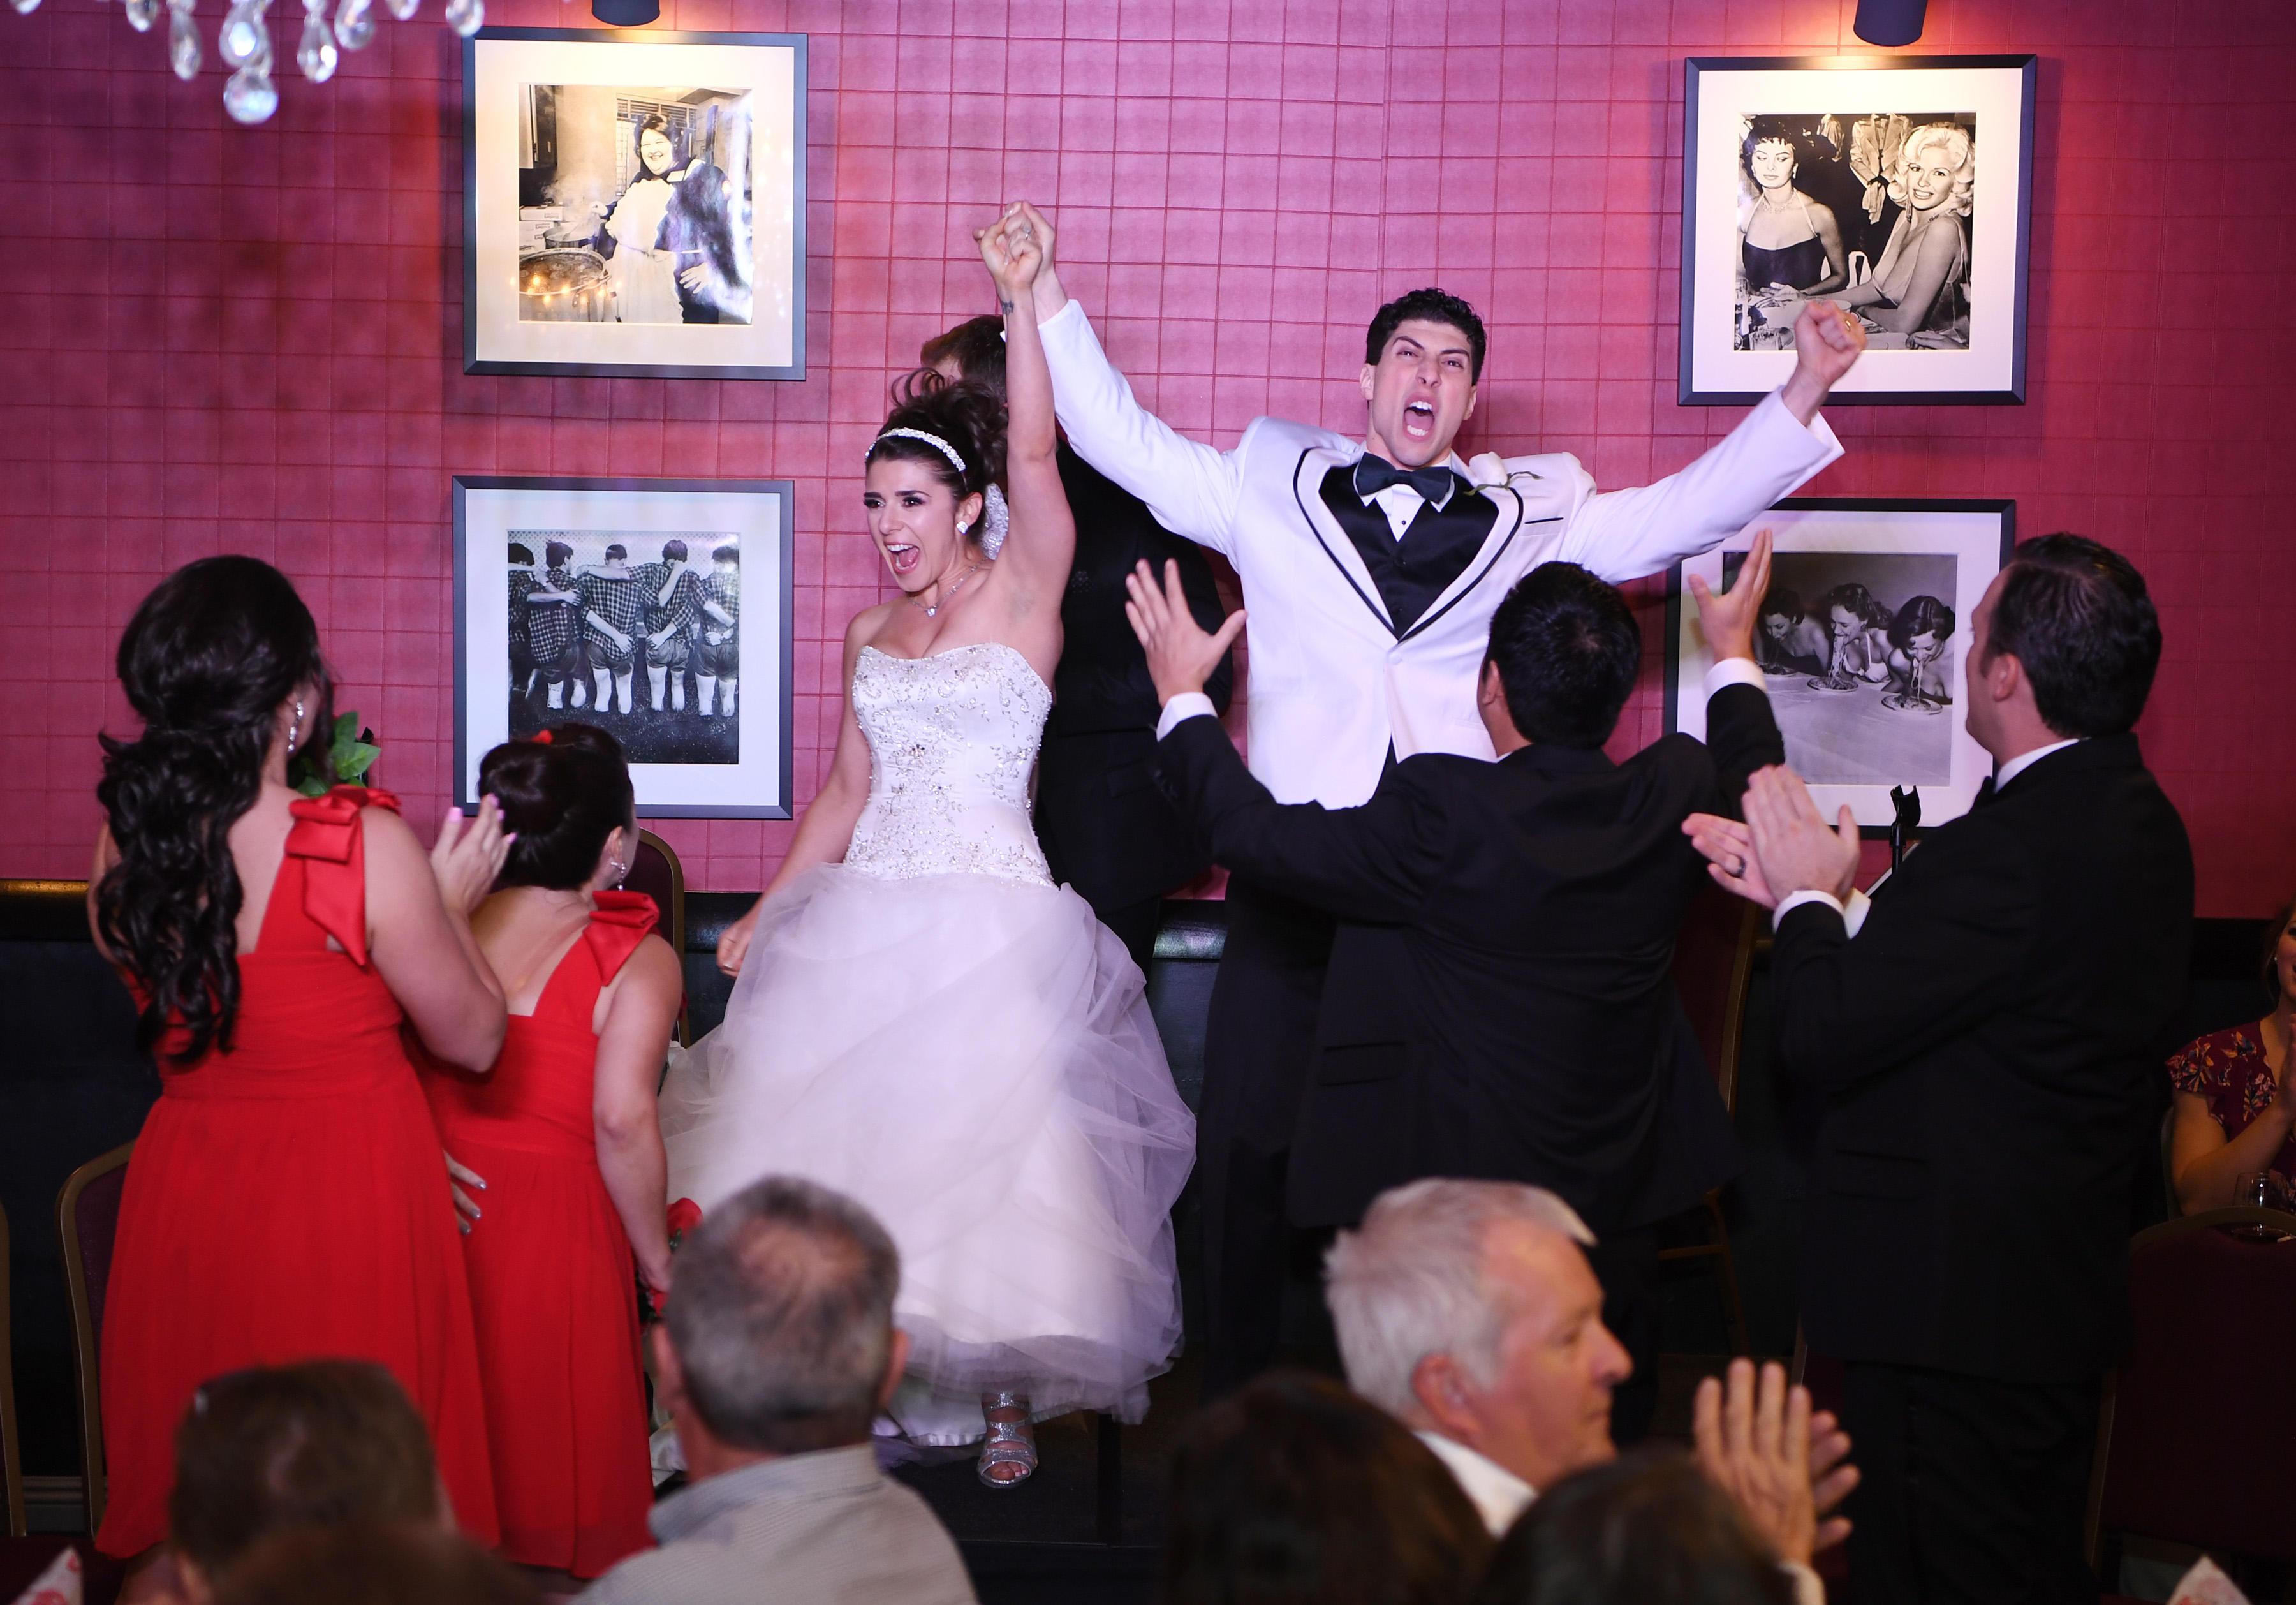 Tony N' Tina's Wedding image 8